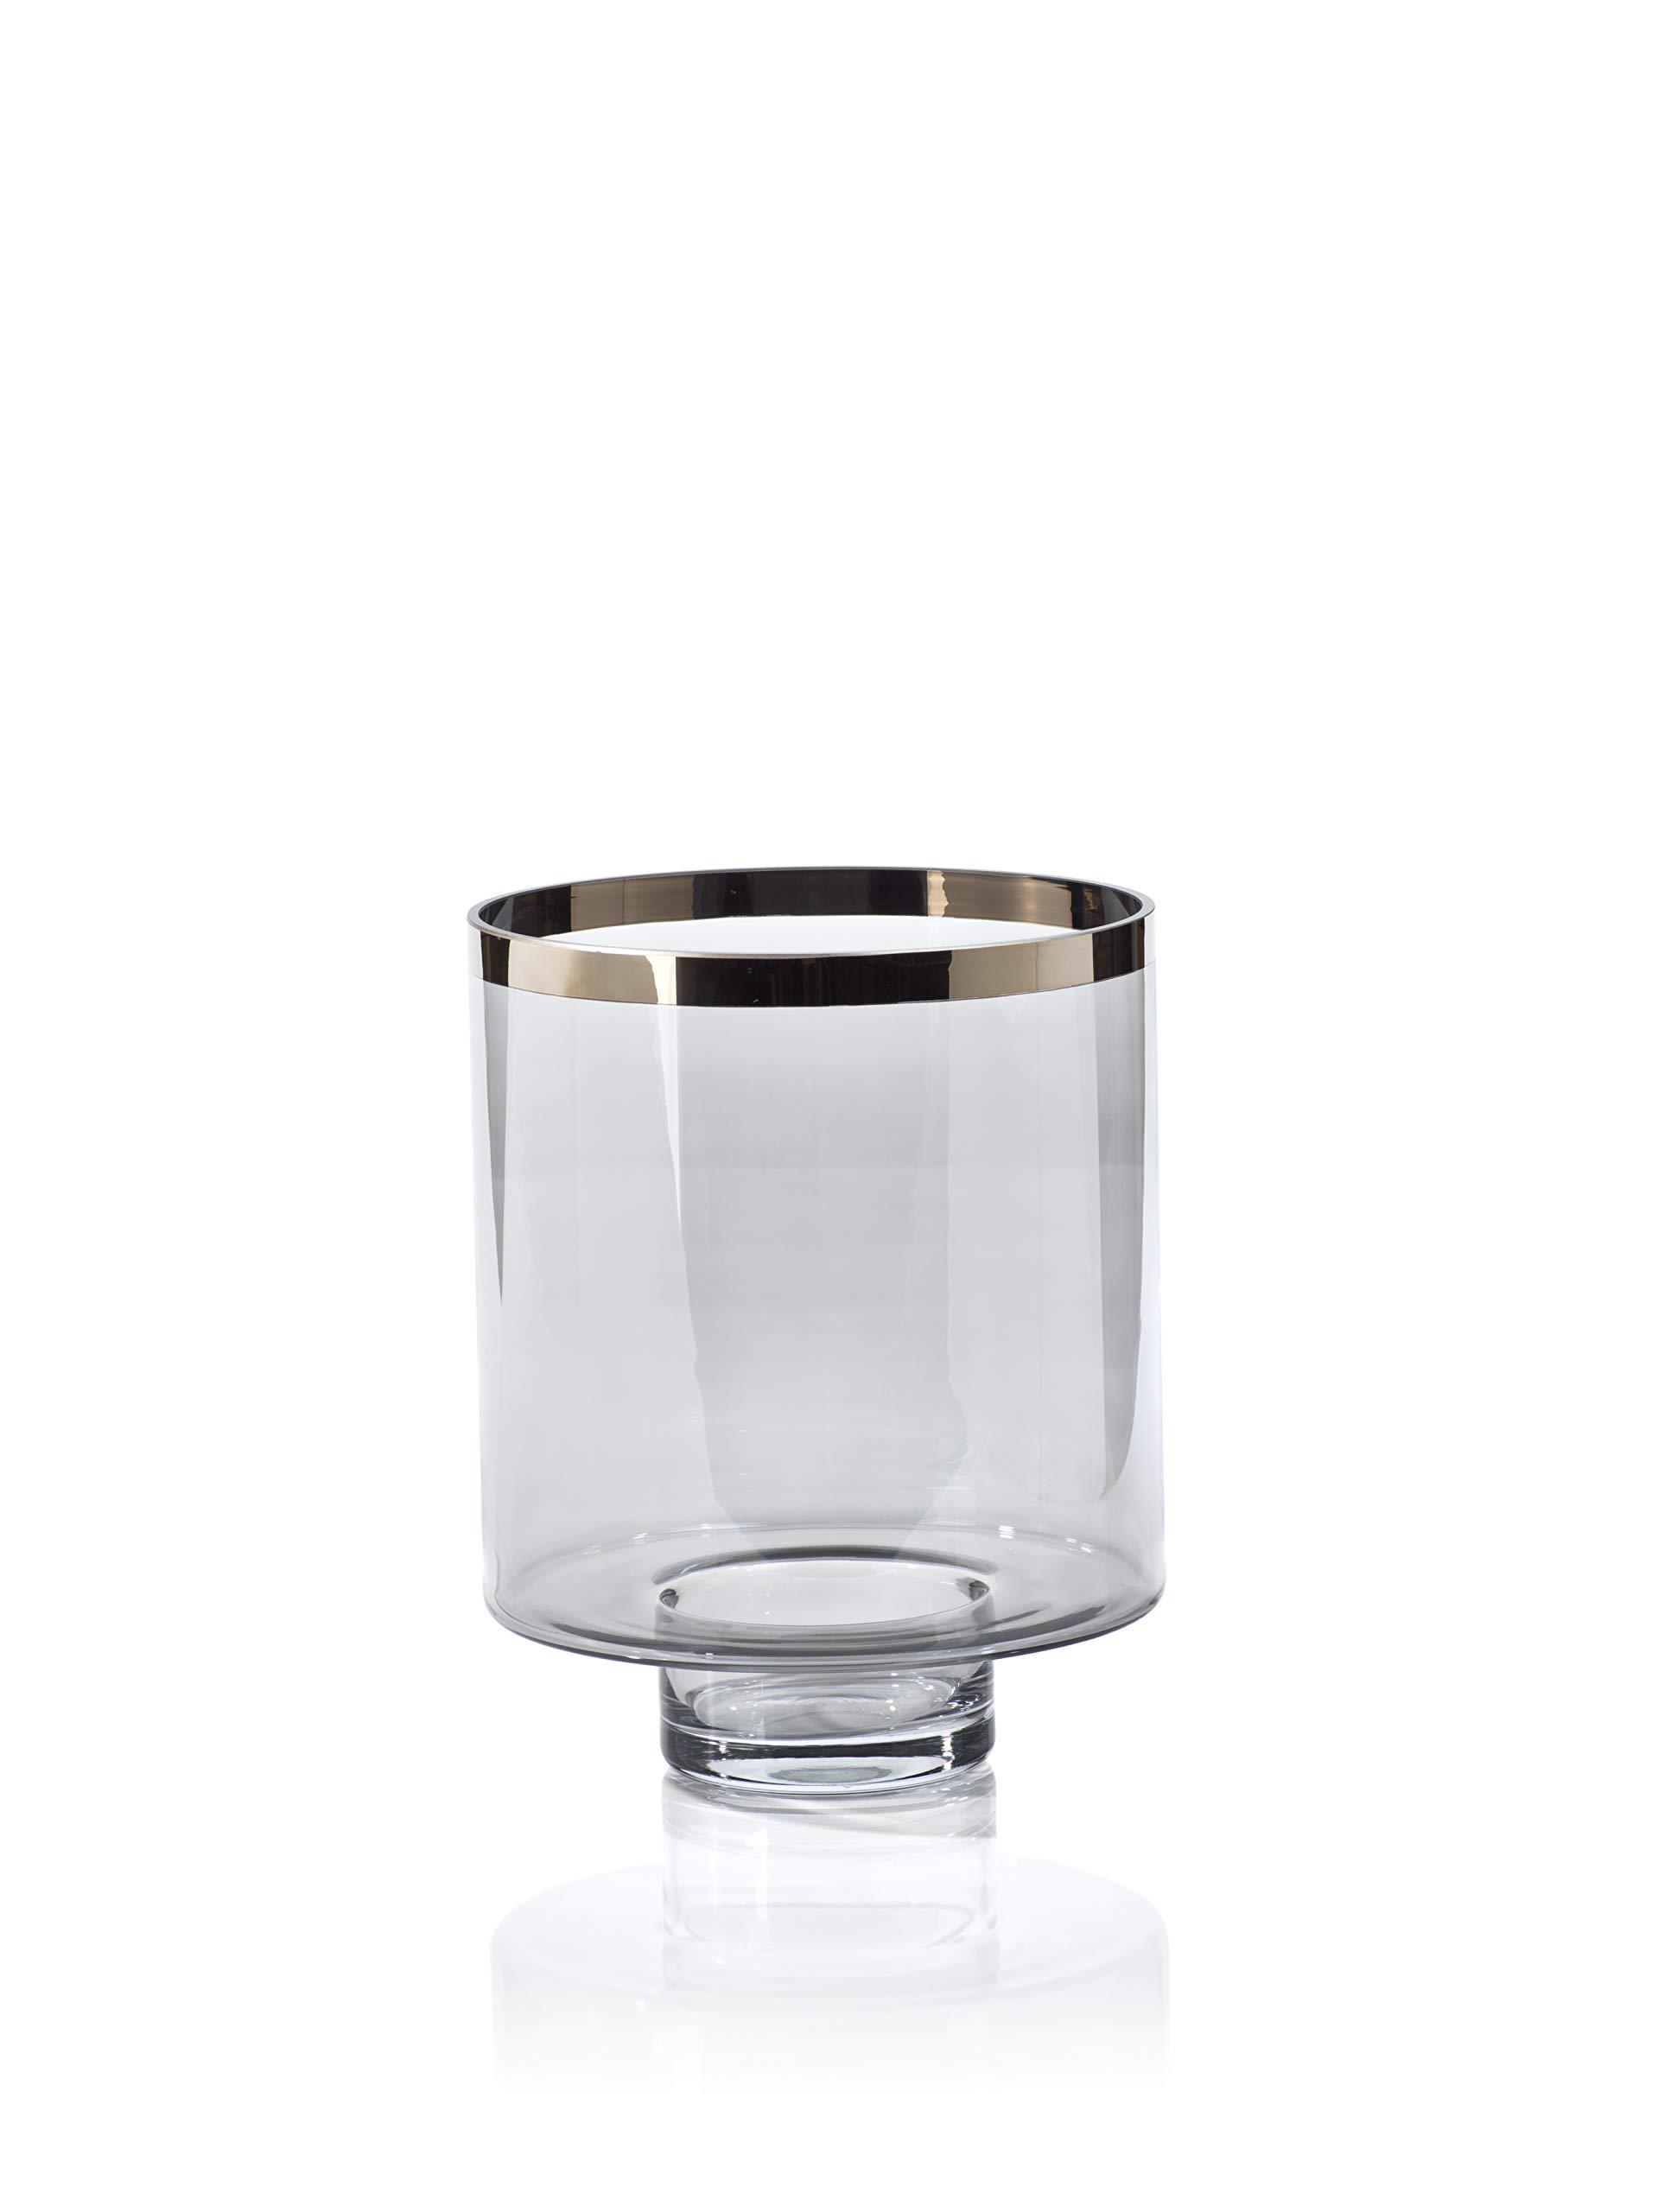 Zodax Black Luster Glass Platinum Rim, Large Hurricane, Gray